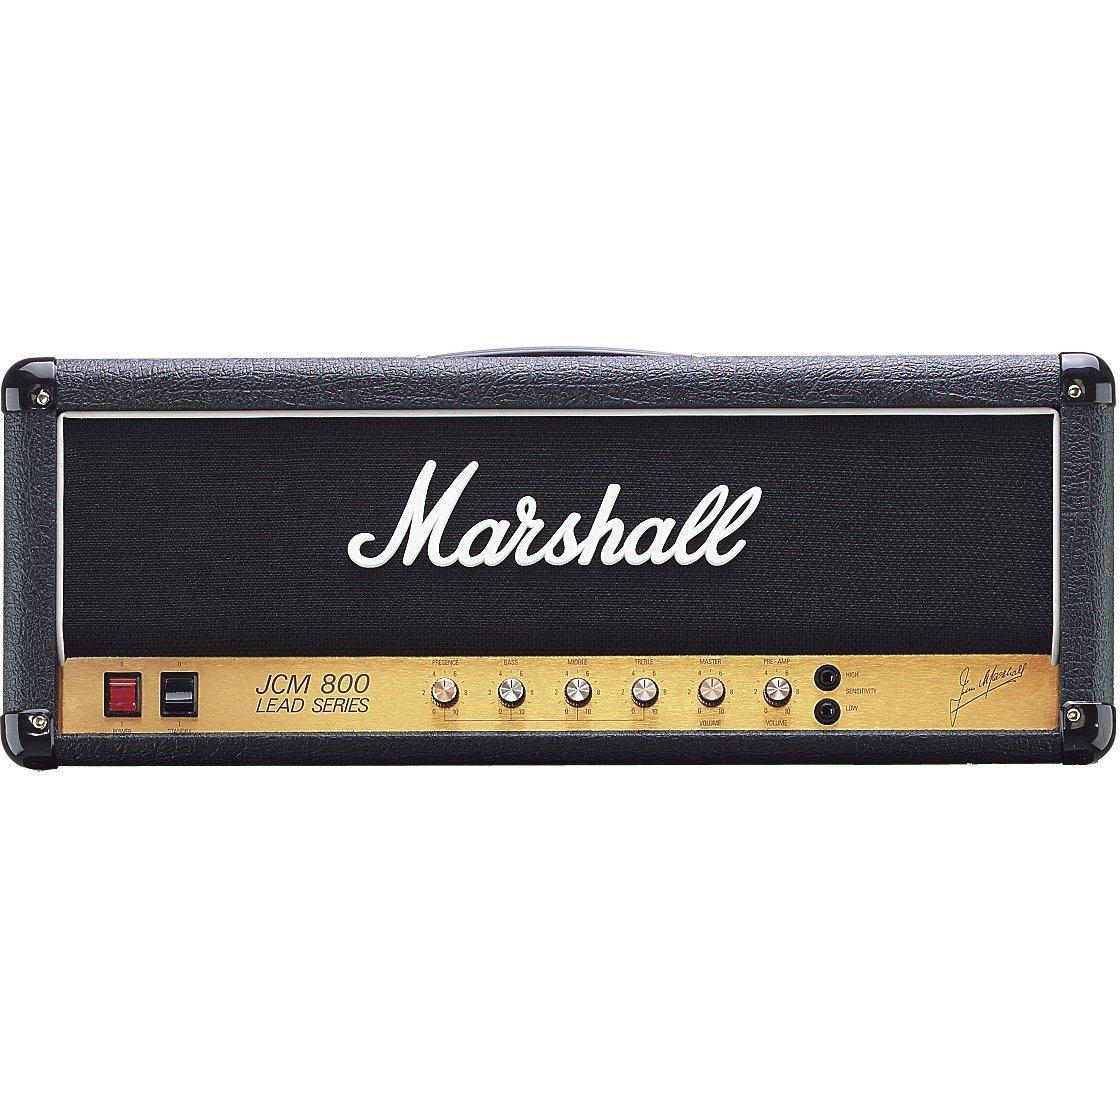 Marshall ギターアンプヘッド 100W 2203 B002AO9DM0